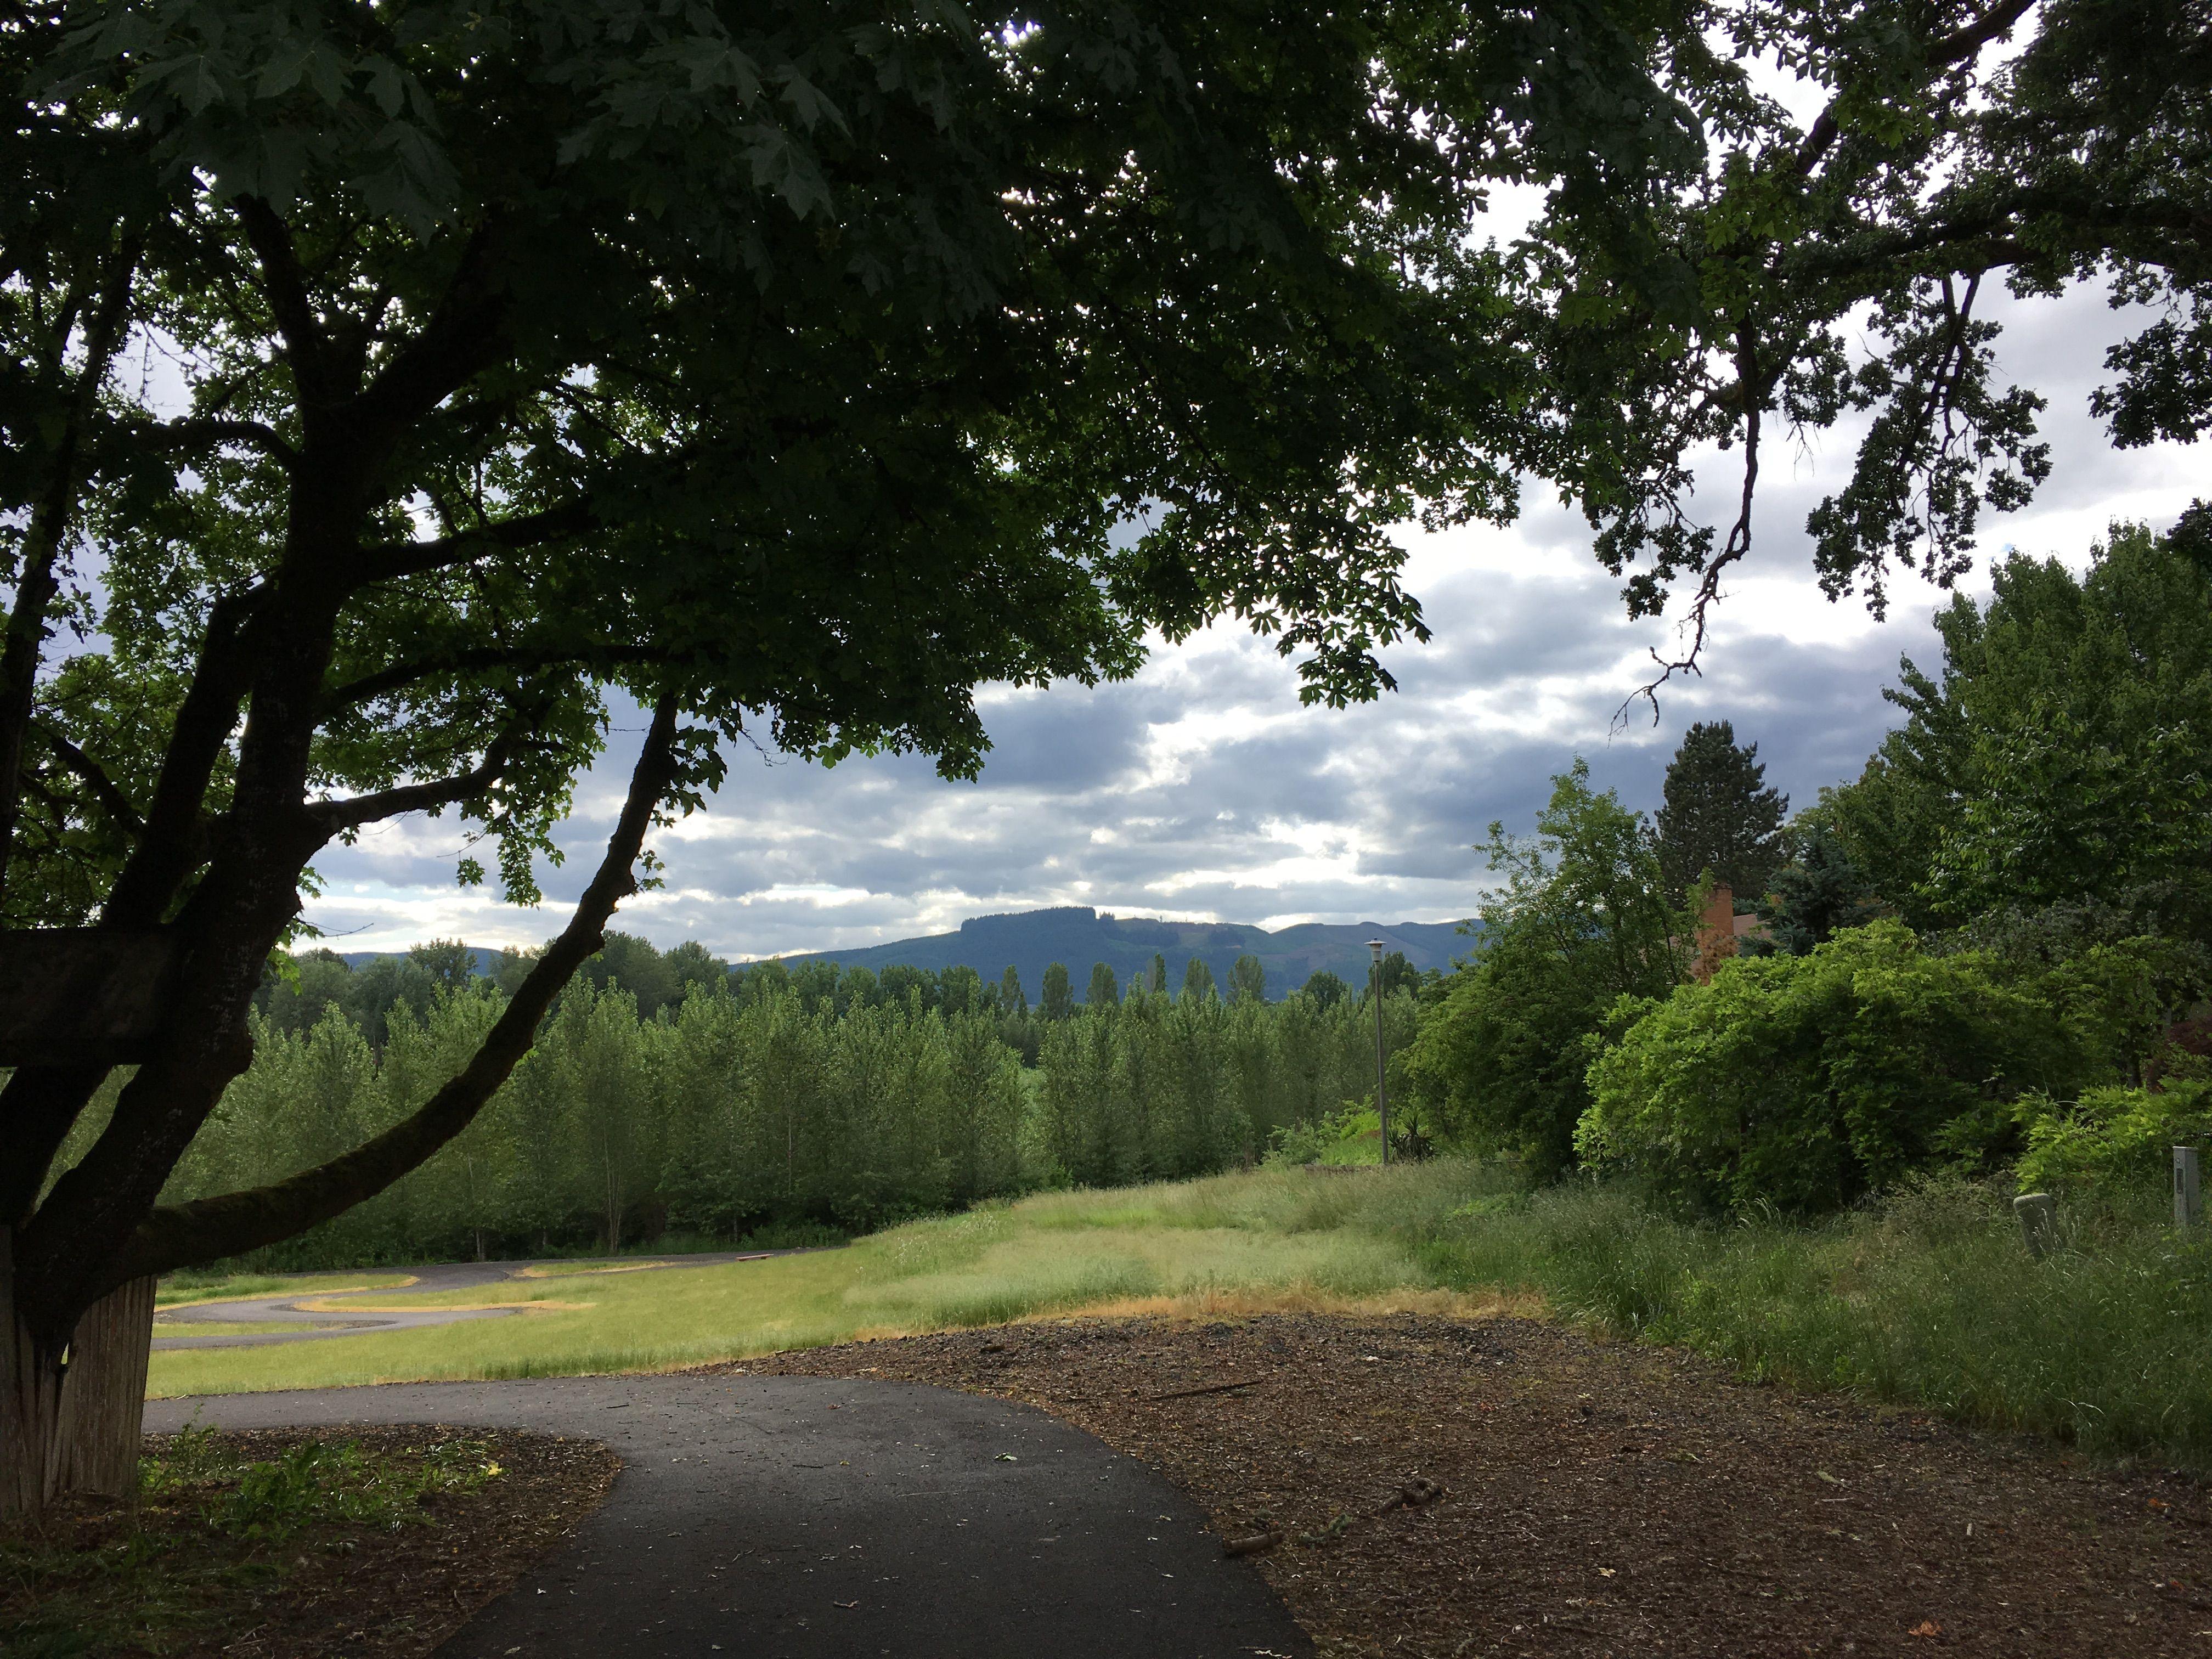 B Street Walking Trail Forest Grove, Oregon Scenery